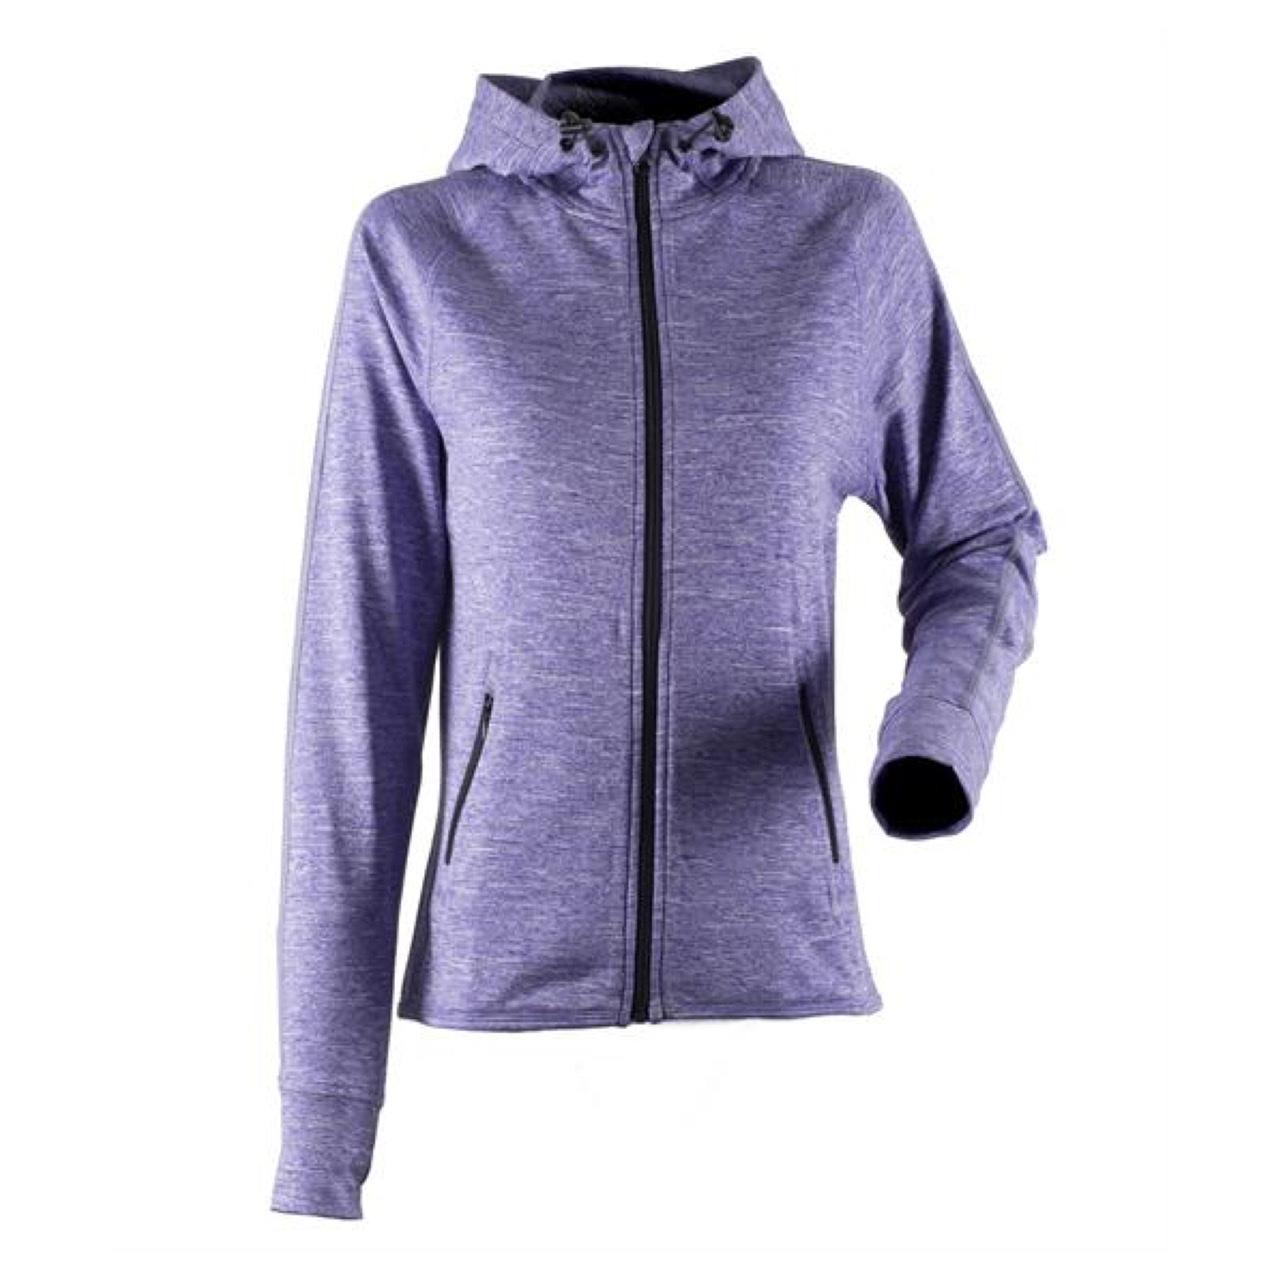 Orlane Purple Marl Running Hoodie